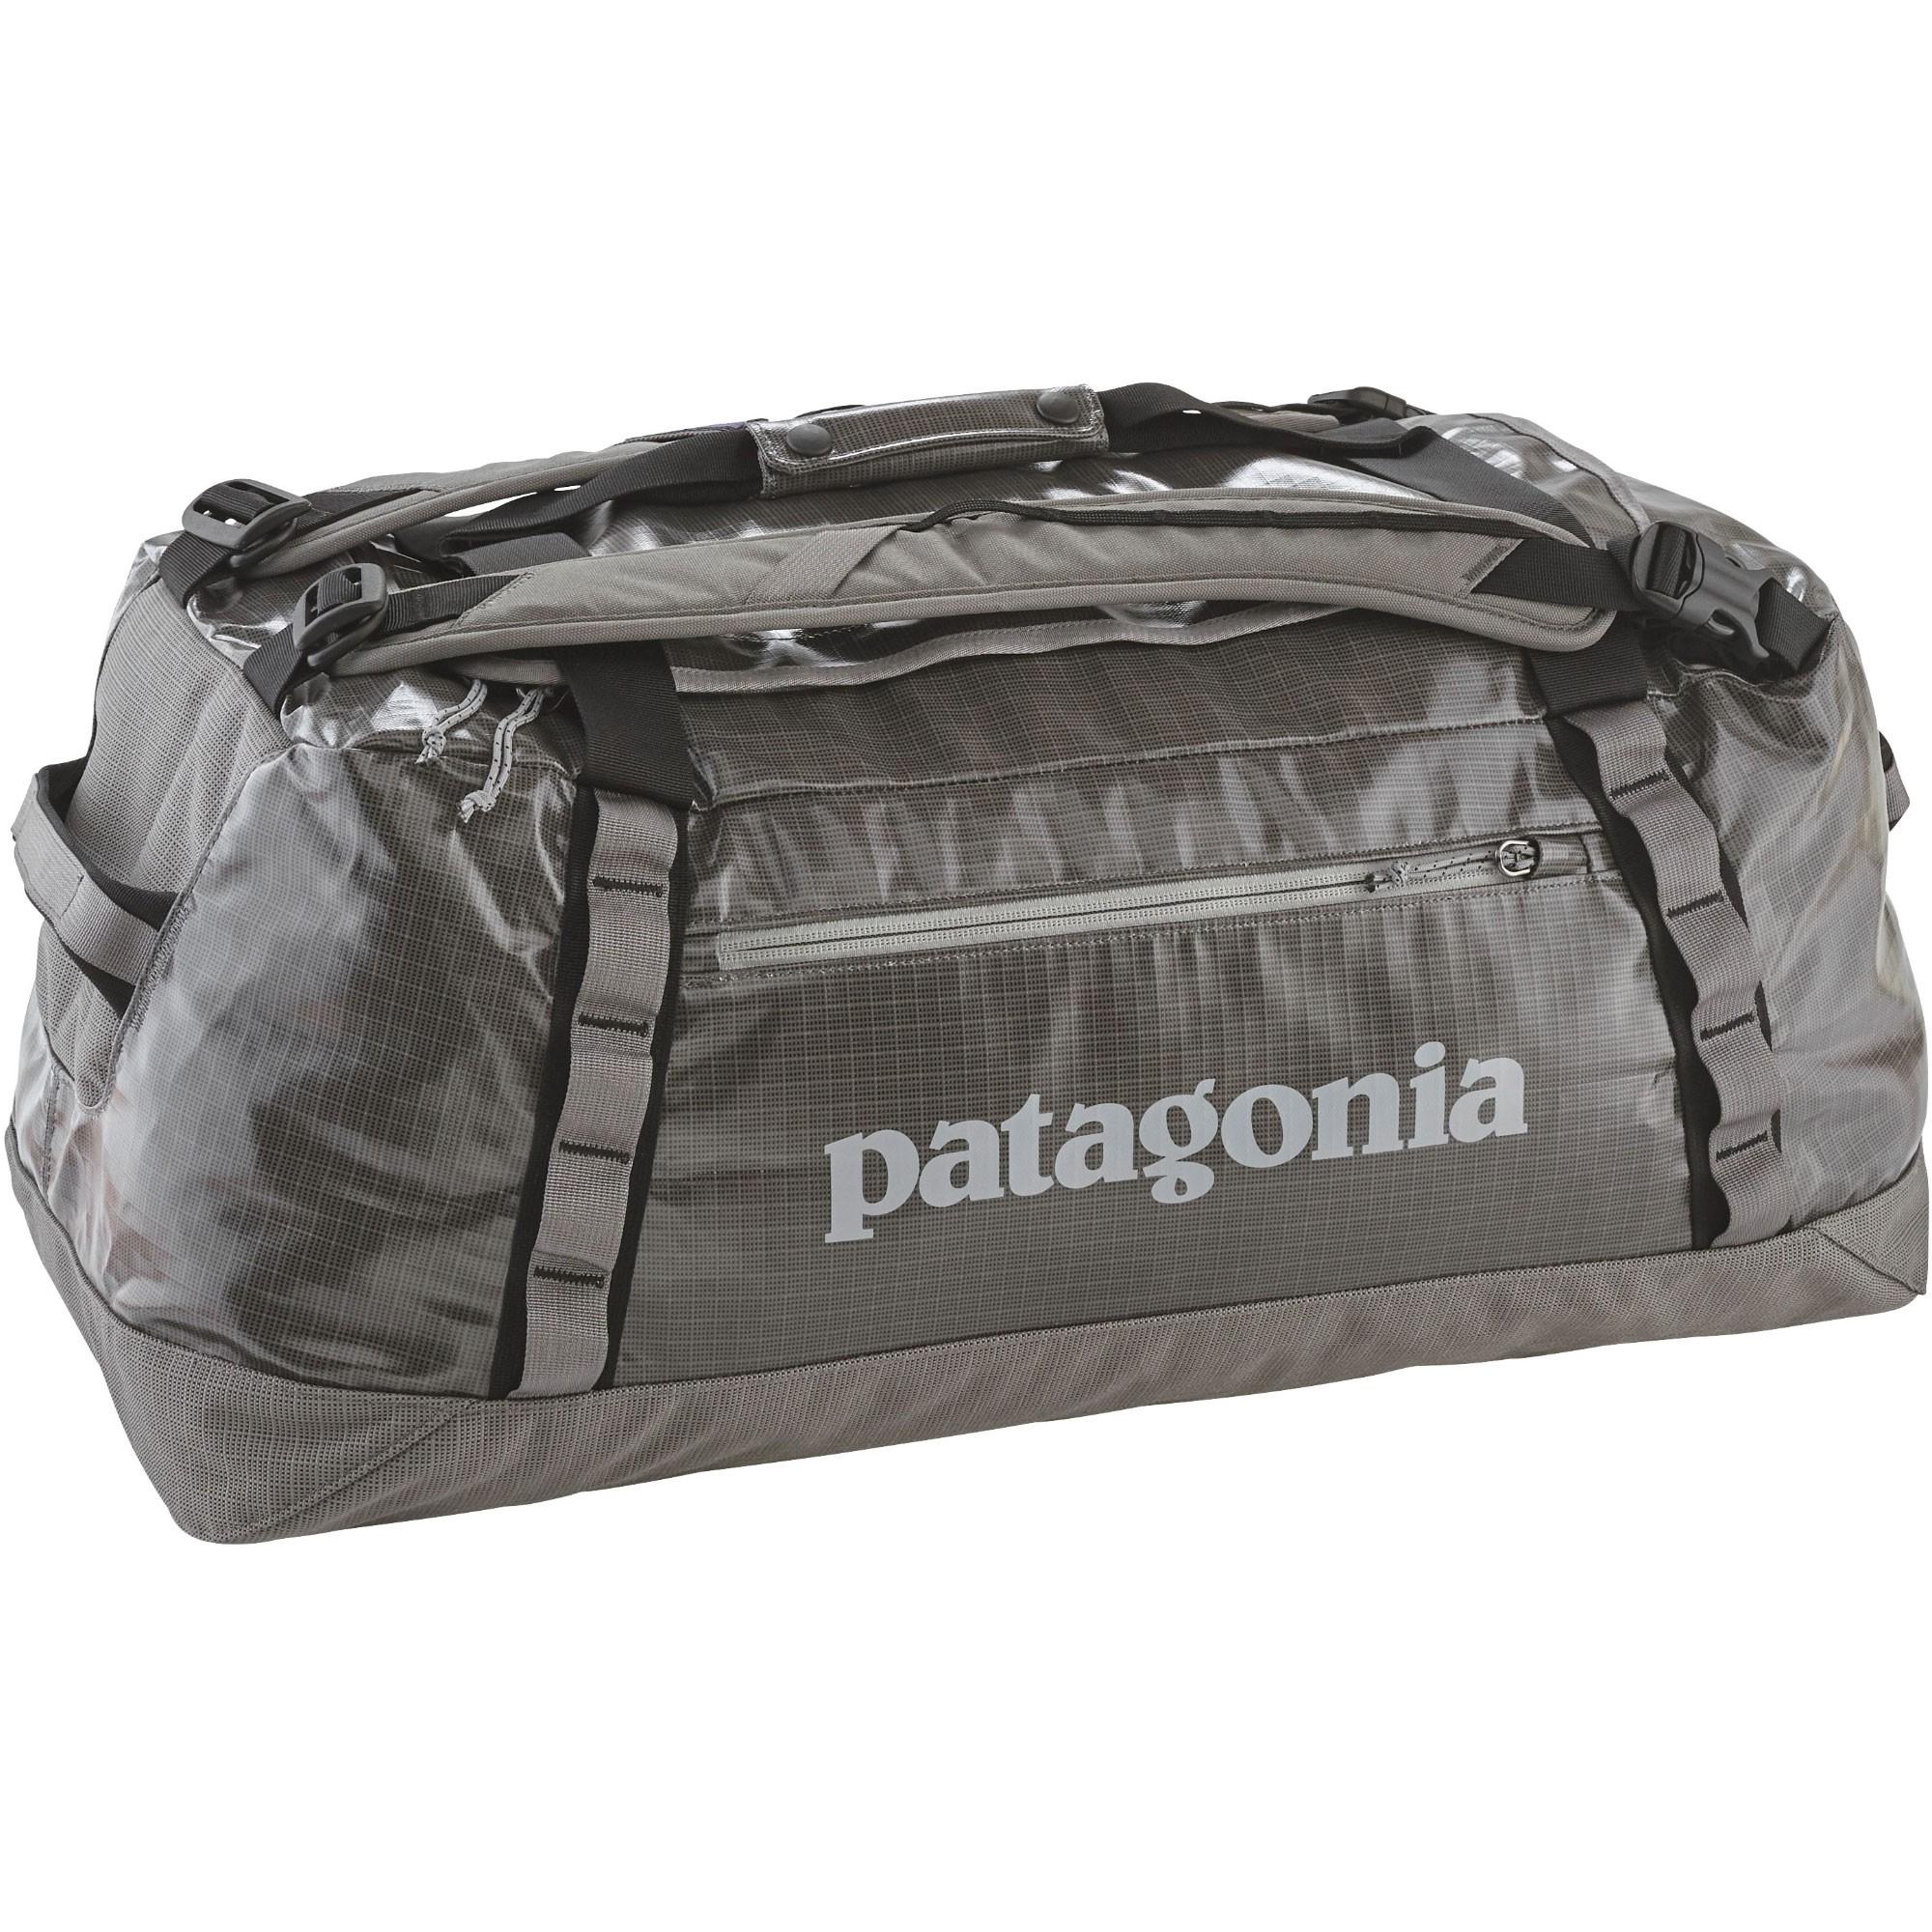 Patagonia Black Hole Duffel 60L - Hex Grey